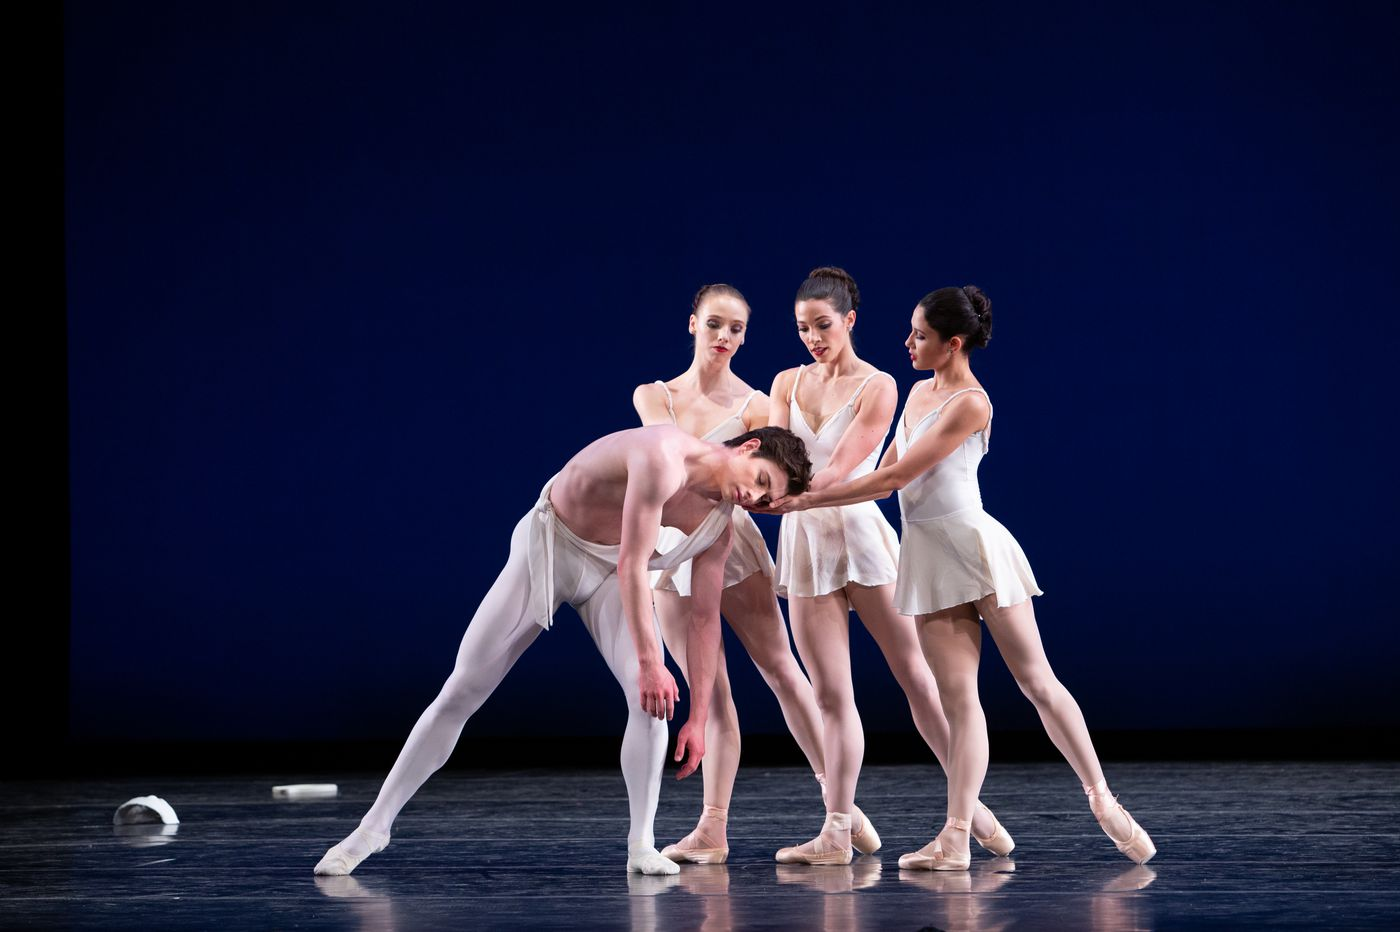 Pa. Ballet's all-Stravinsky program gets those fiendishly difficult rhythms right